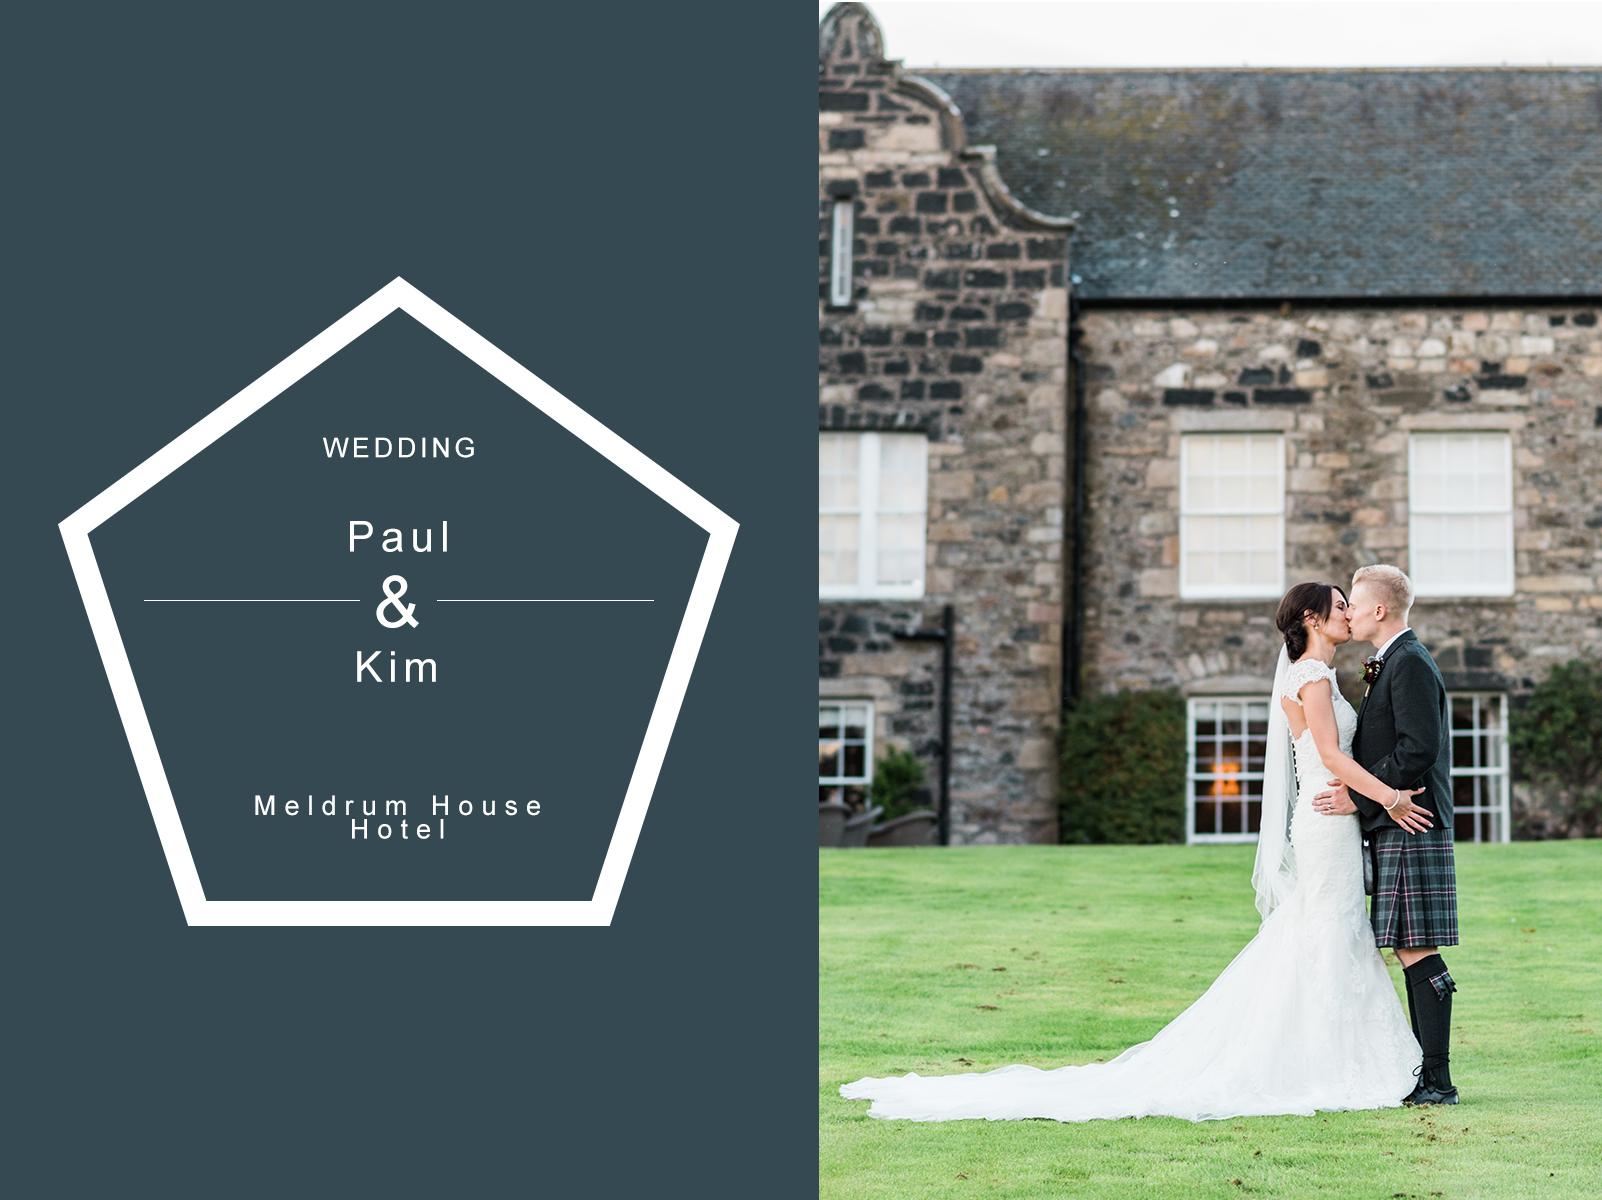 Wedding-Journal-paull-kim.jpg